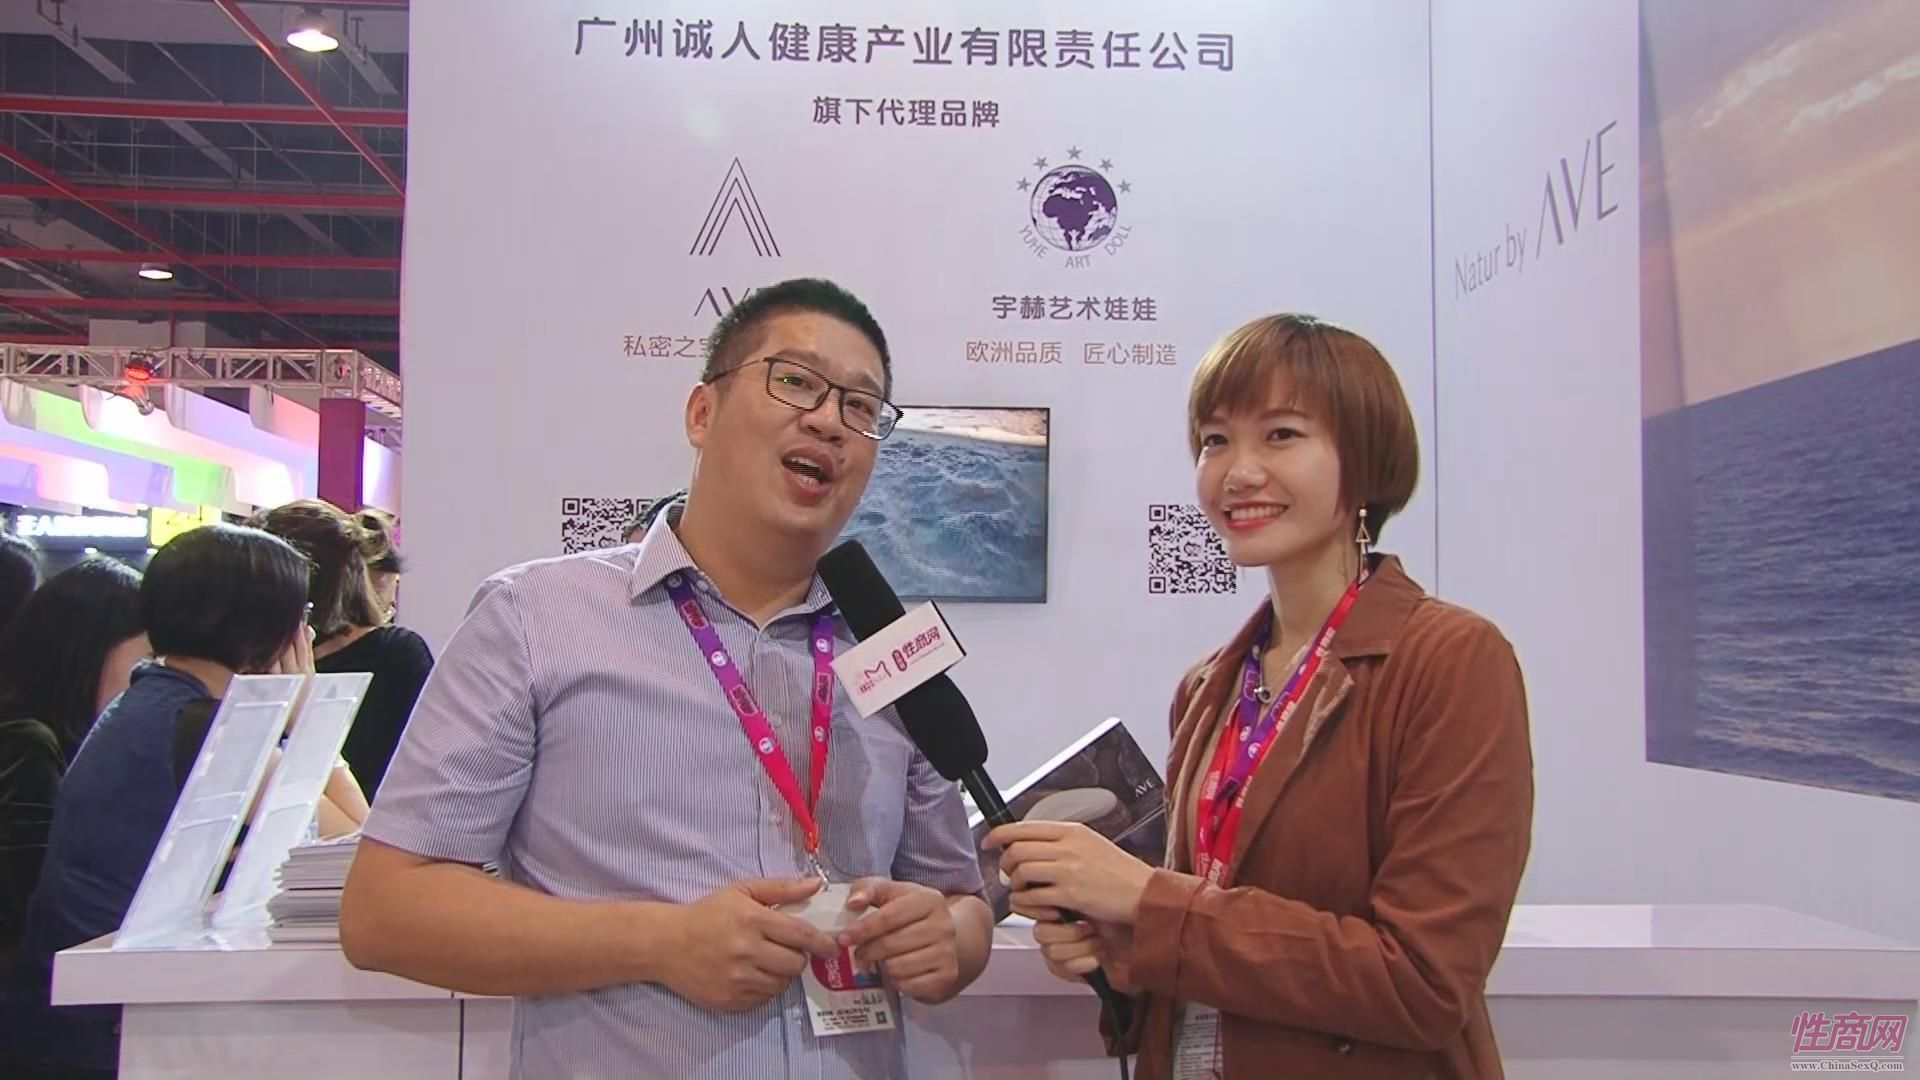 AVE振动器-2017广州性文化节性商网专访